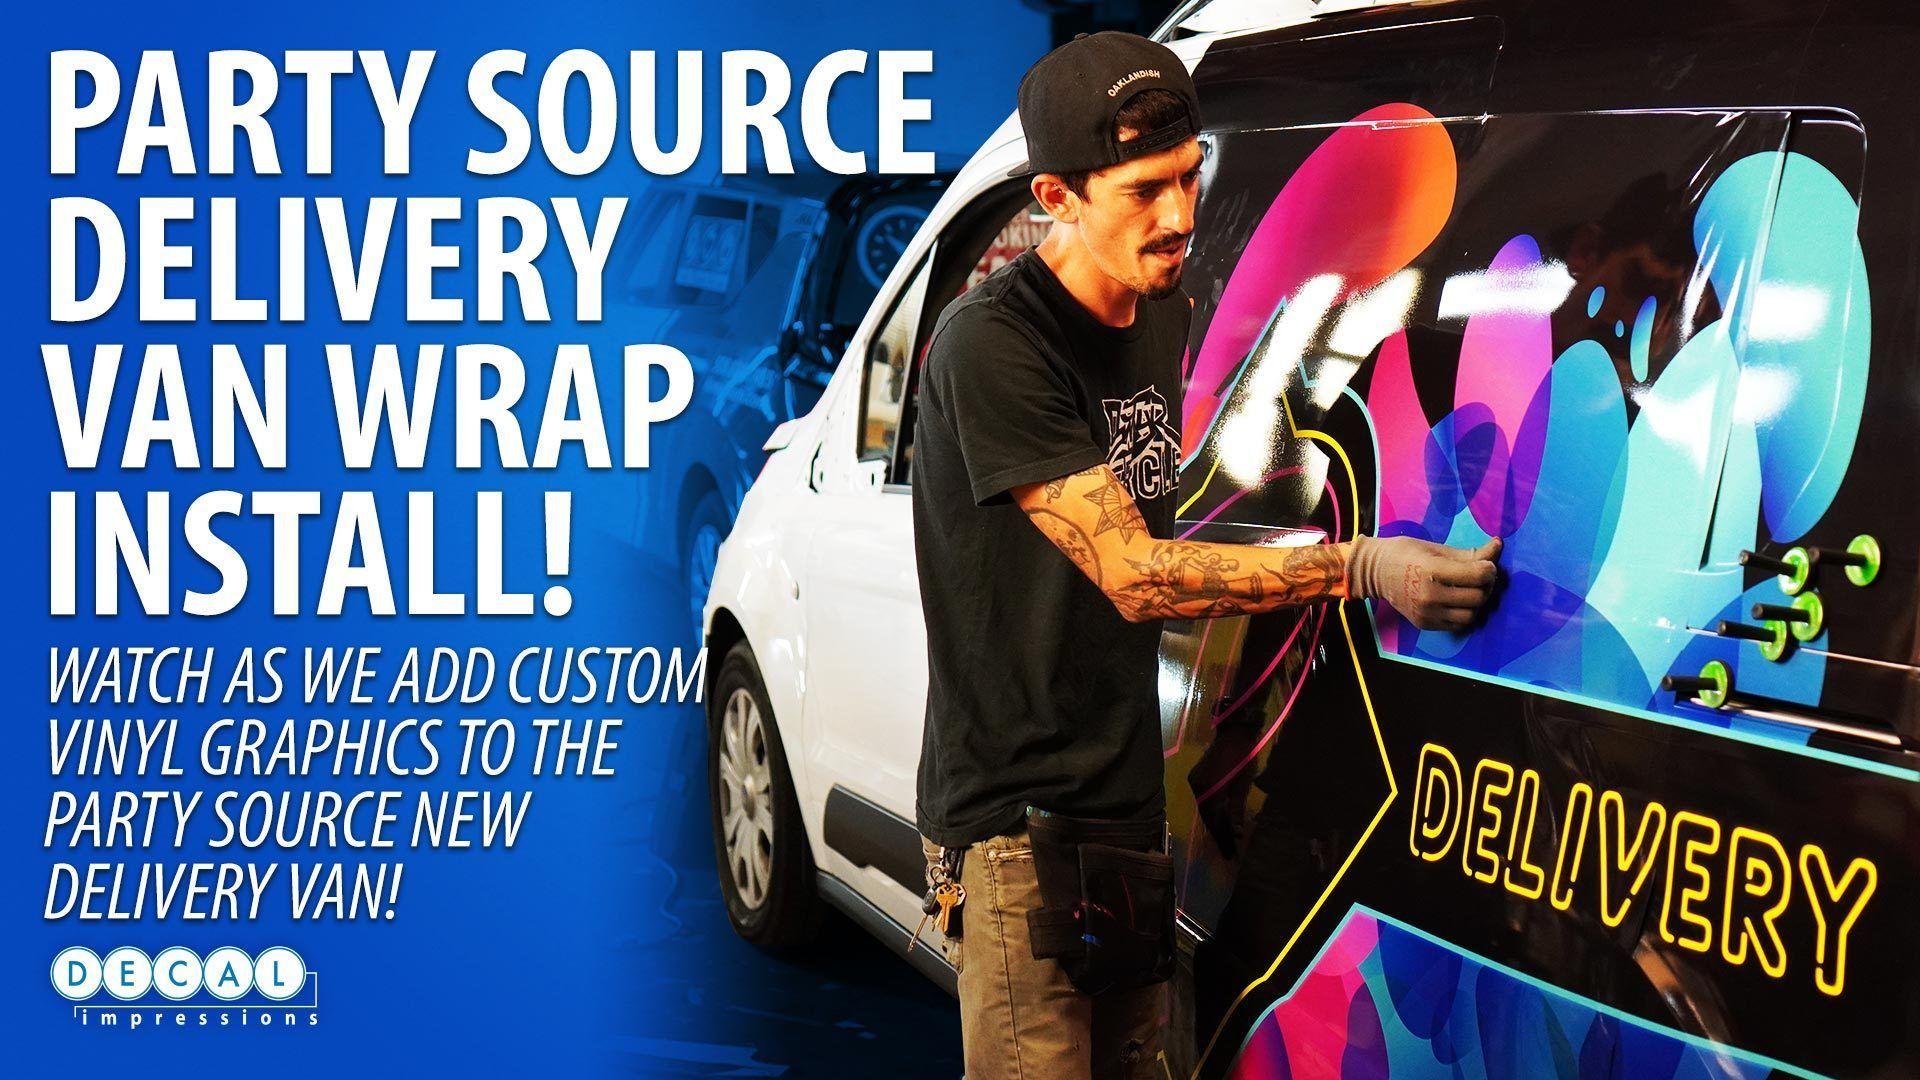 Party Source Delivery Van Wrap